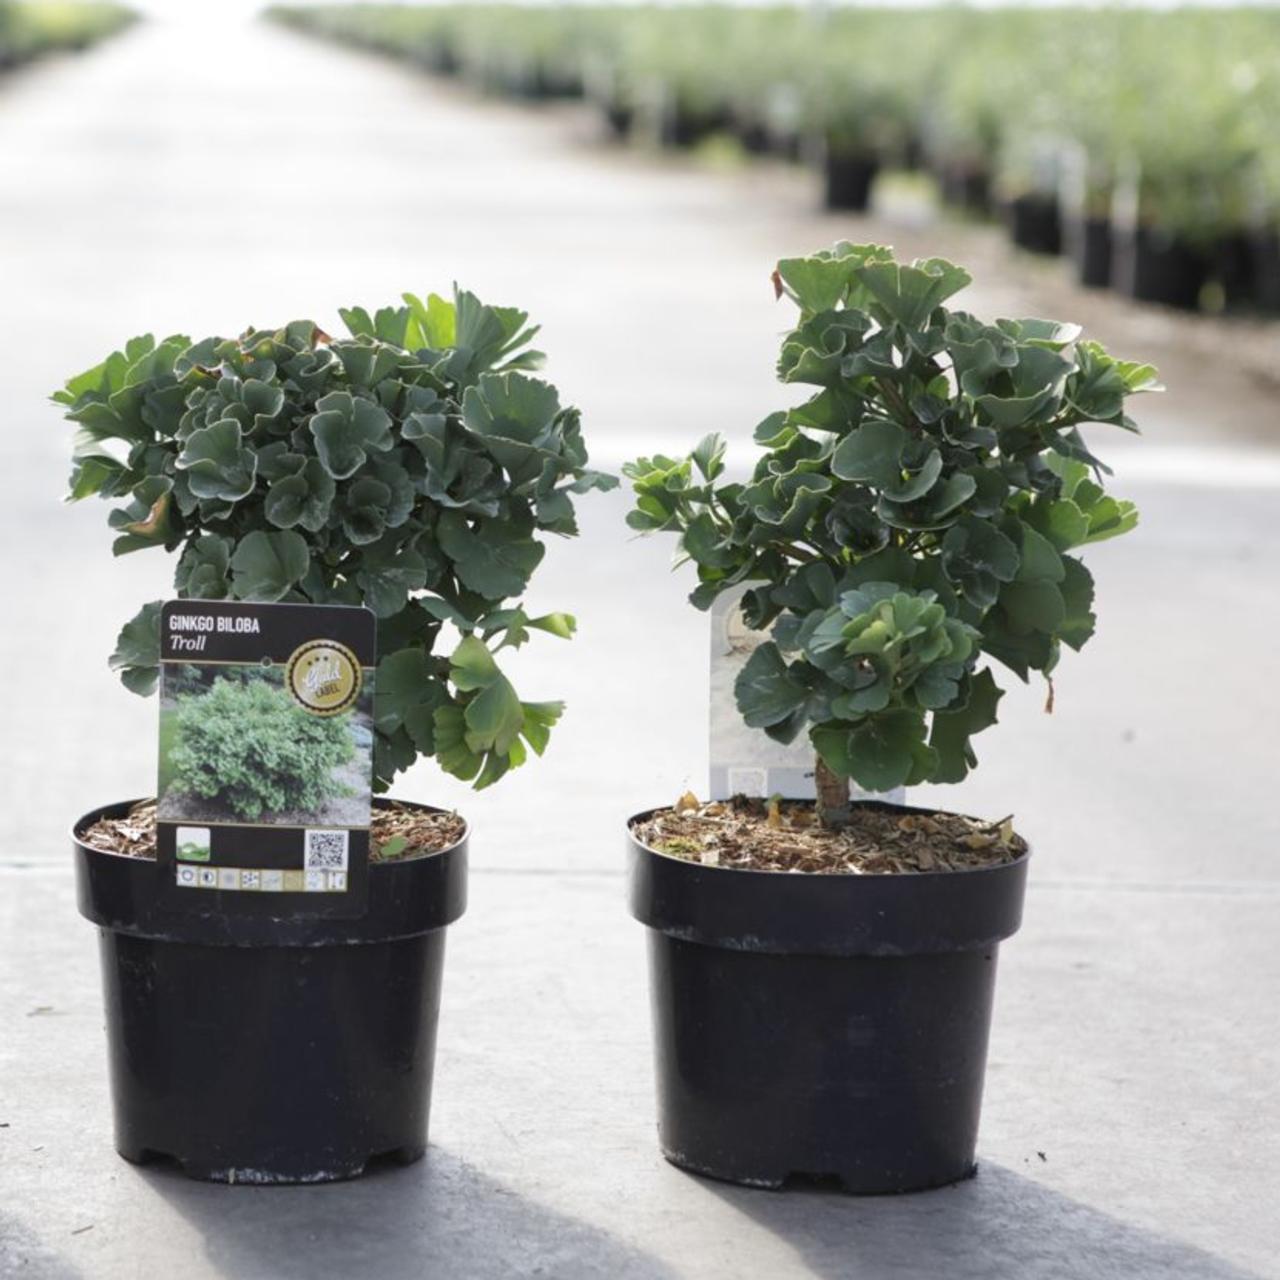 Ginkgo biloba 'Troll' plant